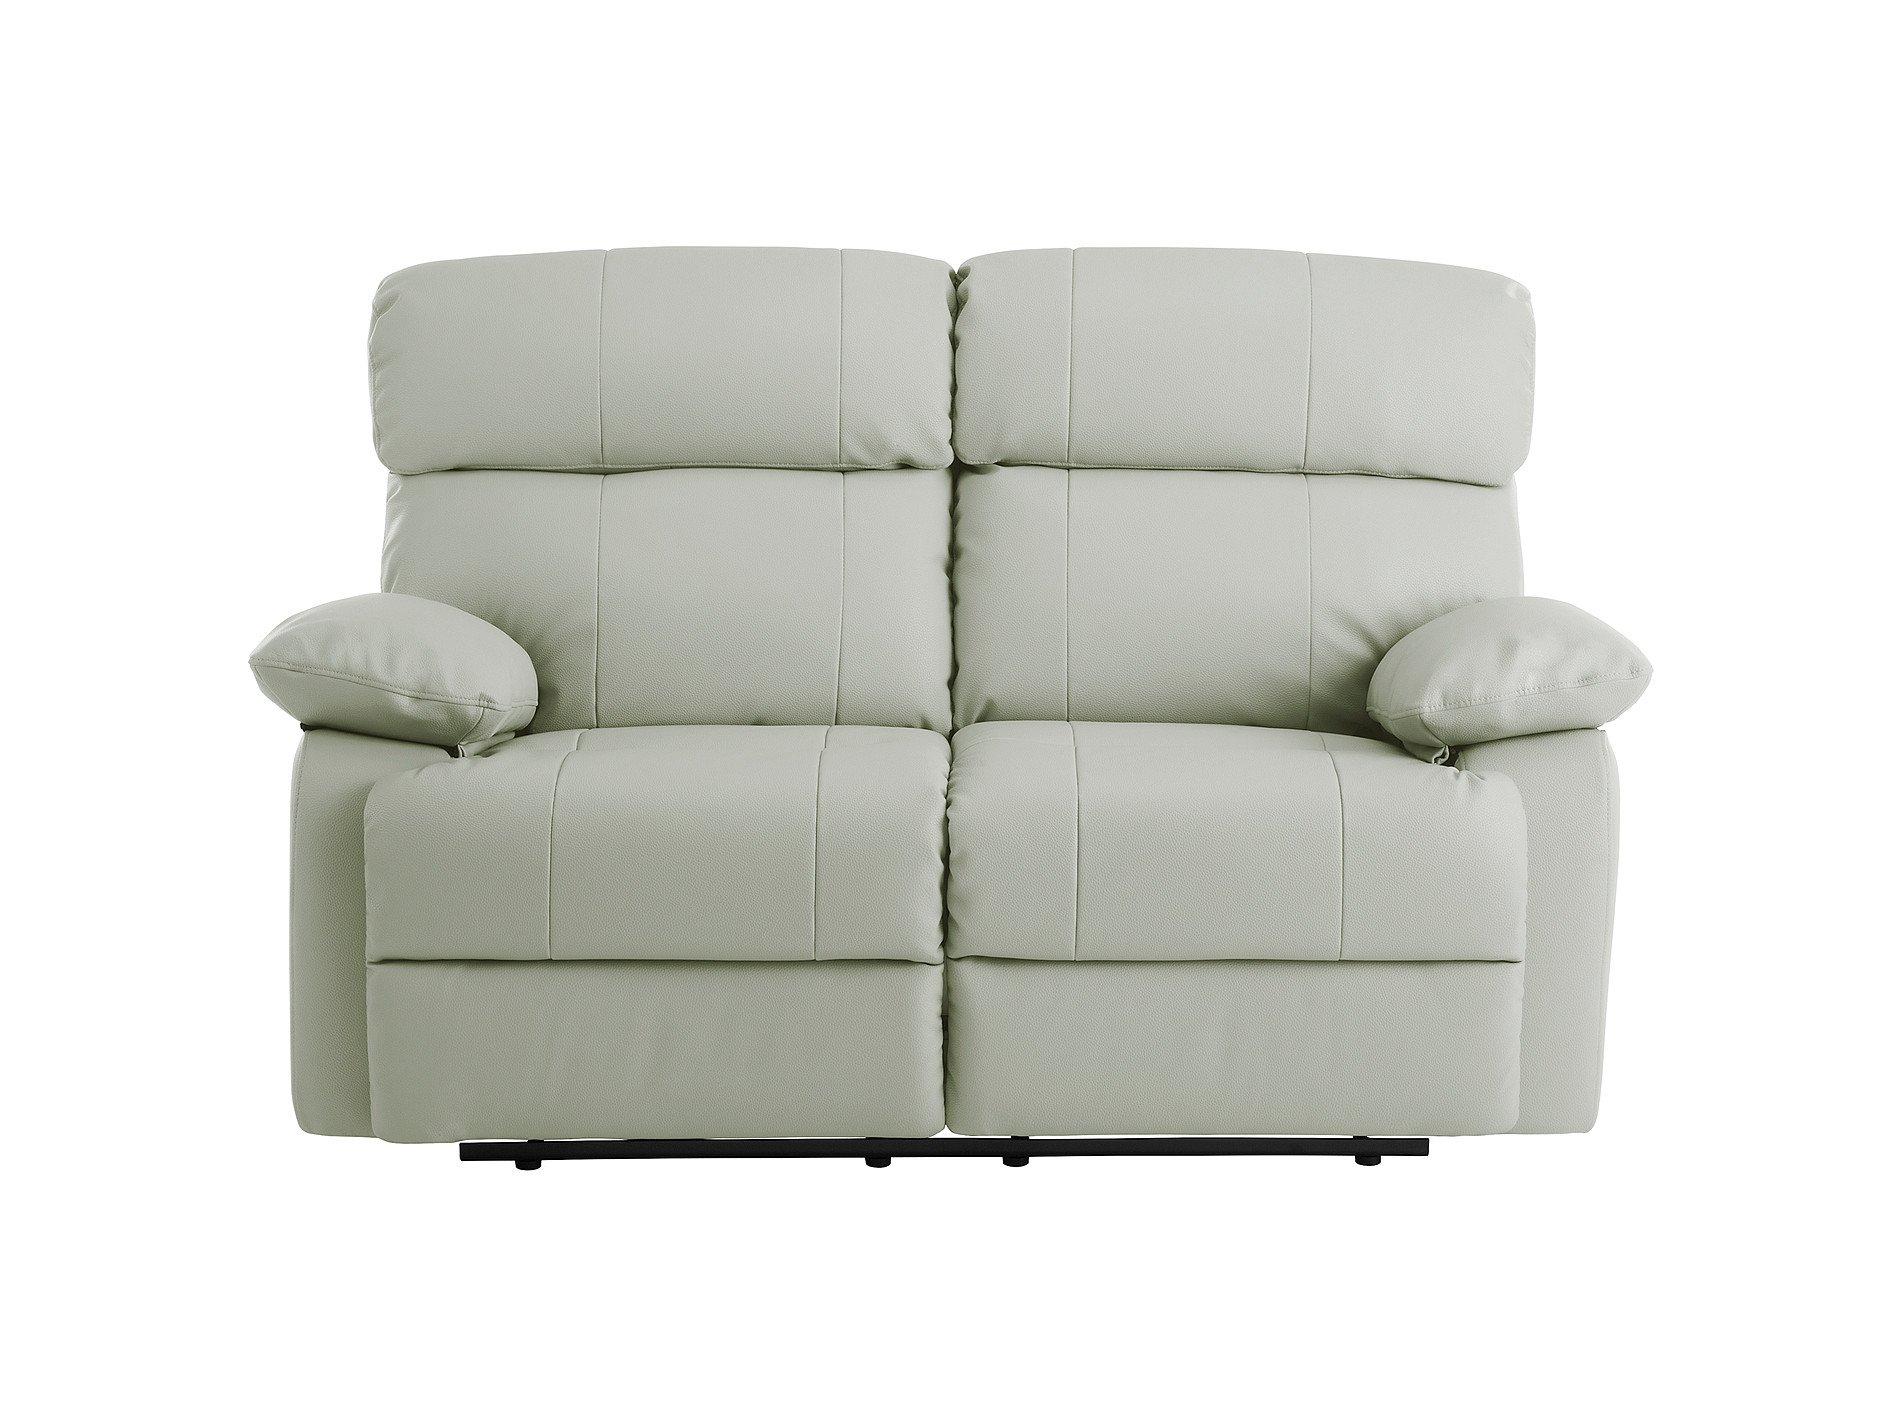 small sofa recliner kota charcoal fabric 3 seater bed quantity